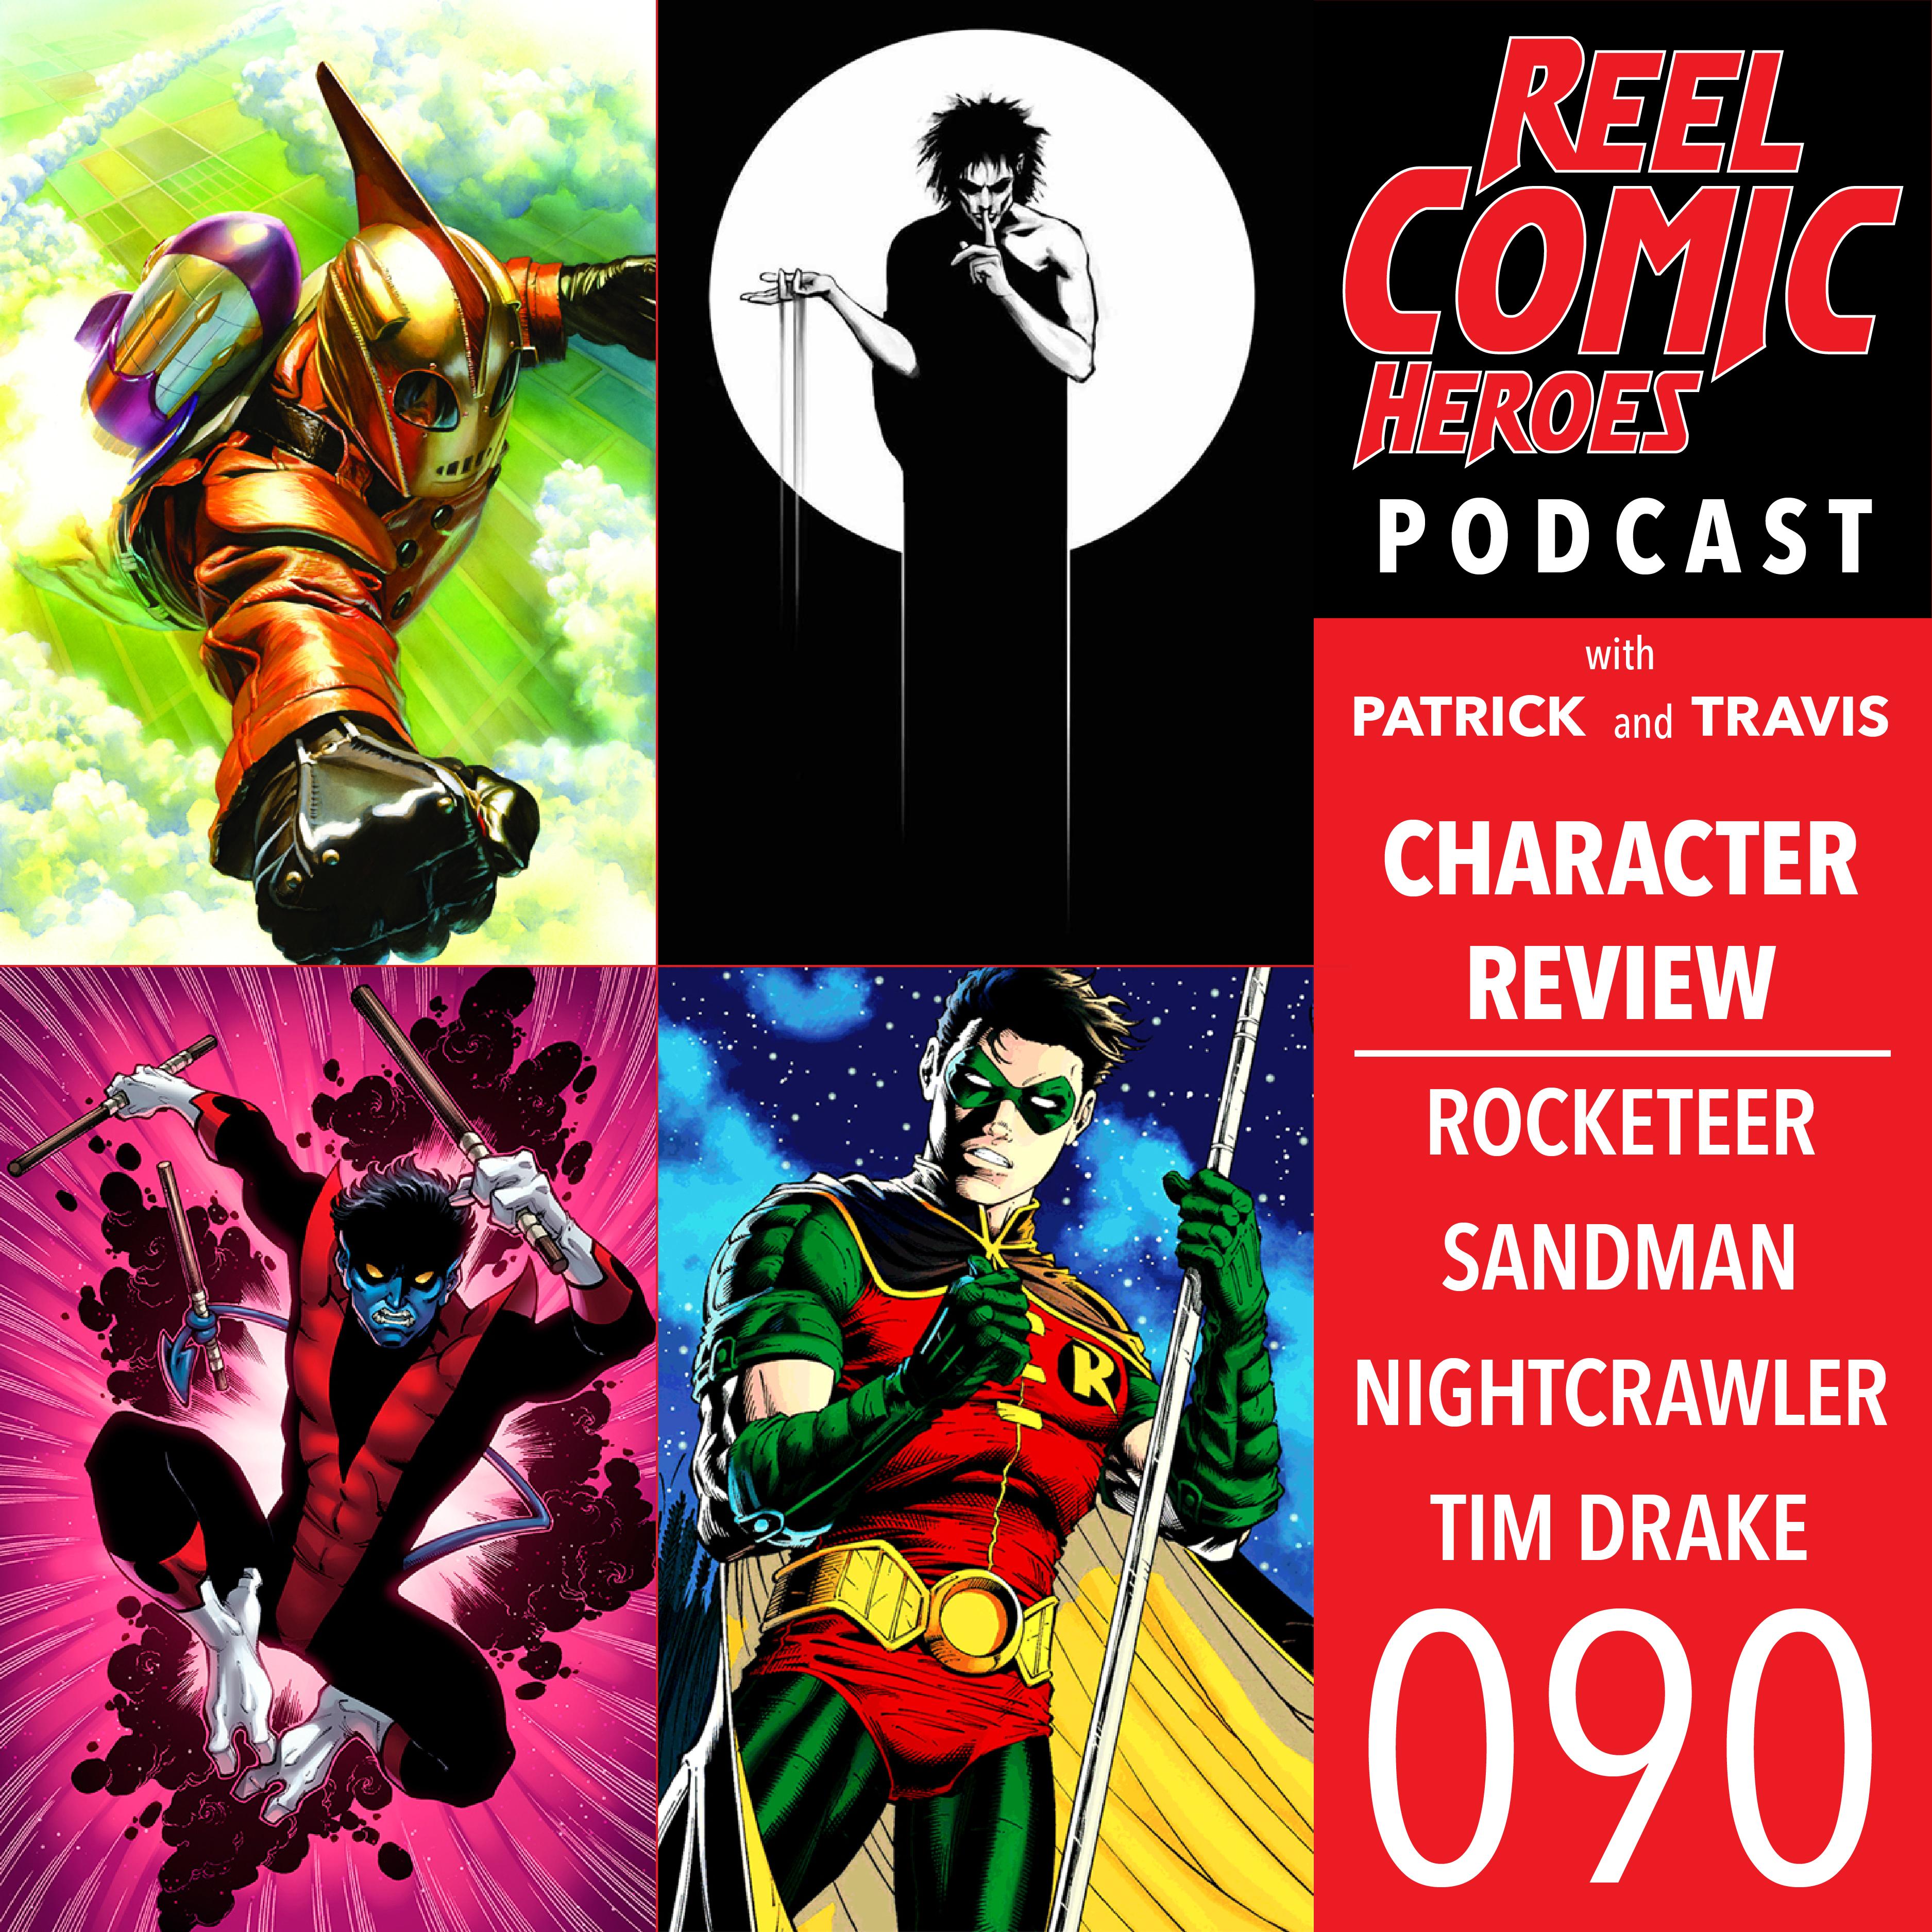 Artwork for 090 - Character Review - The Rocketeer, Sandman, Nightcrawler, & Tim Drake